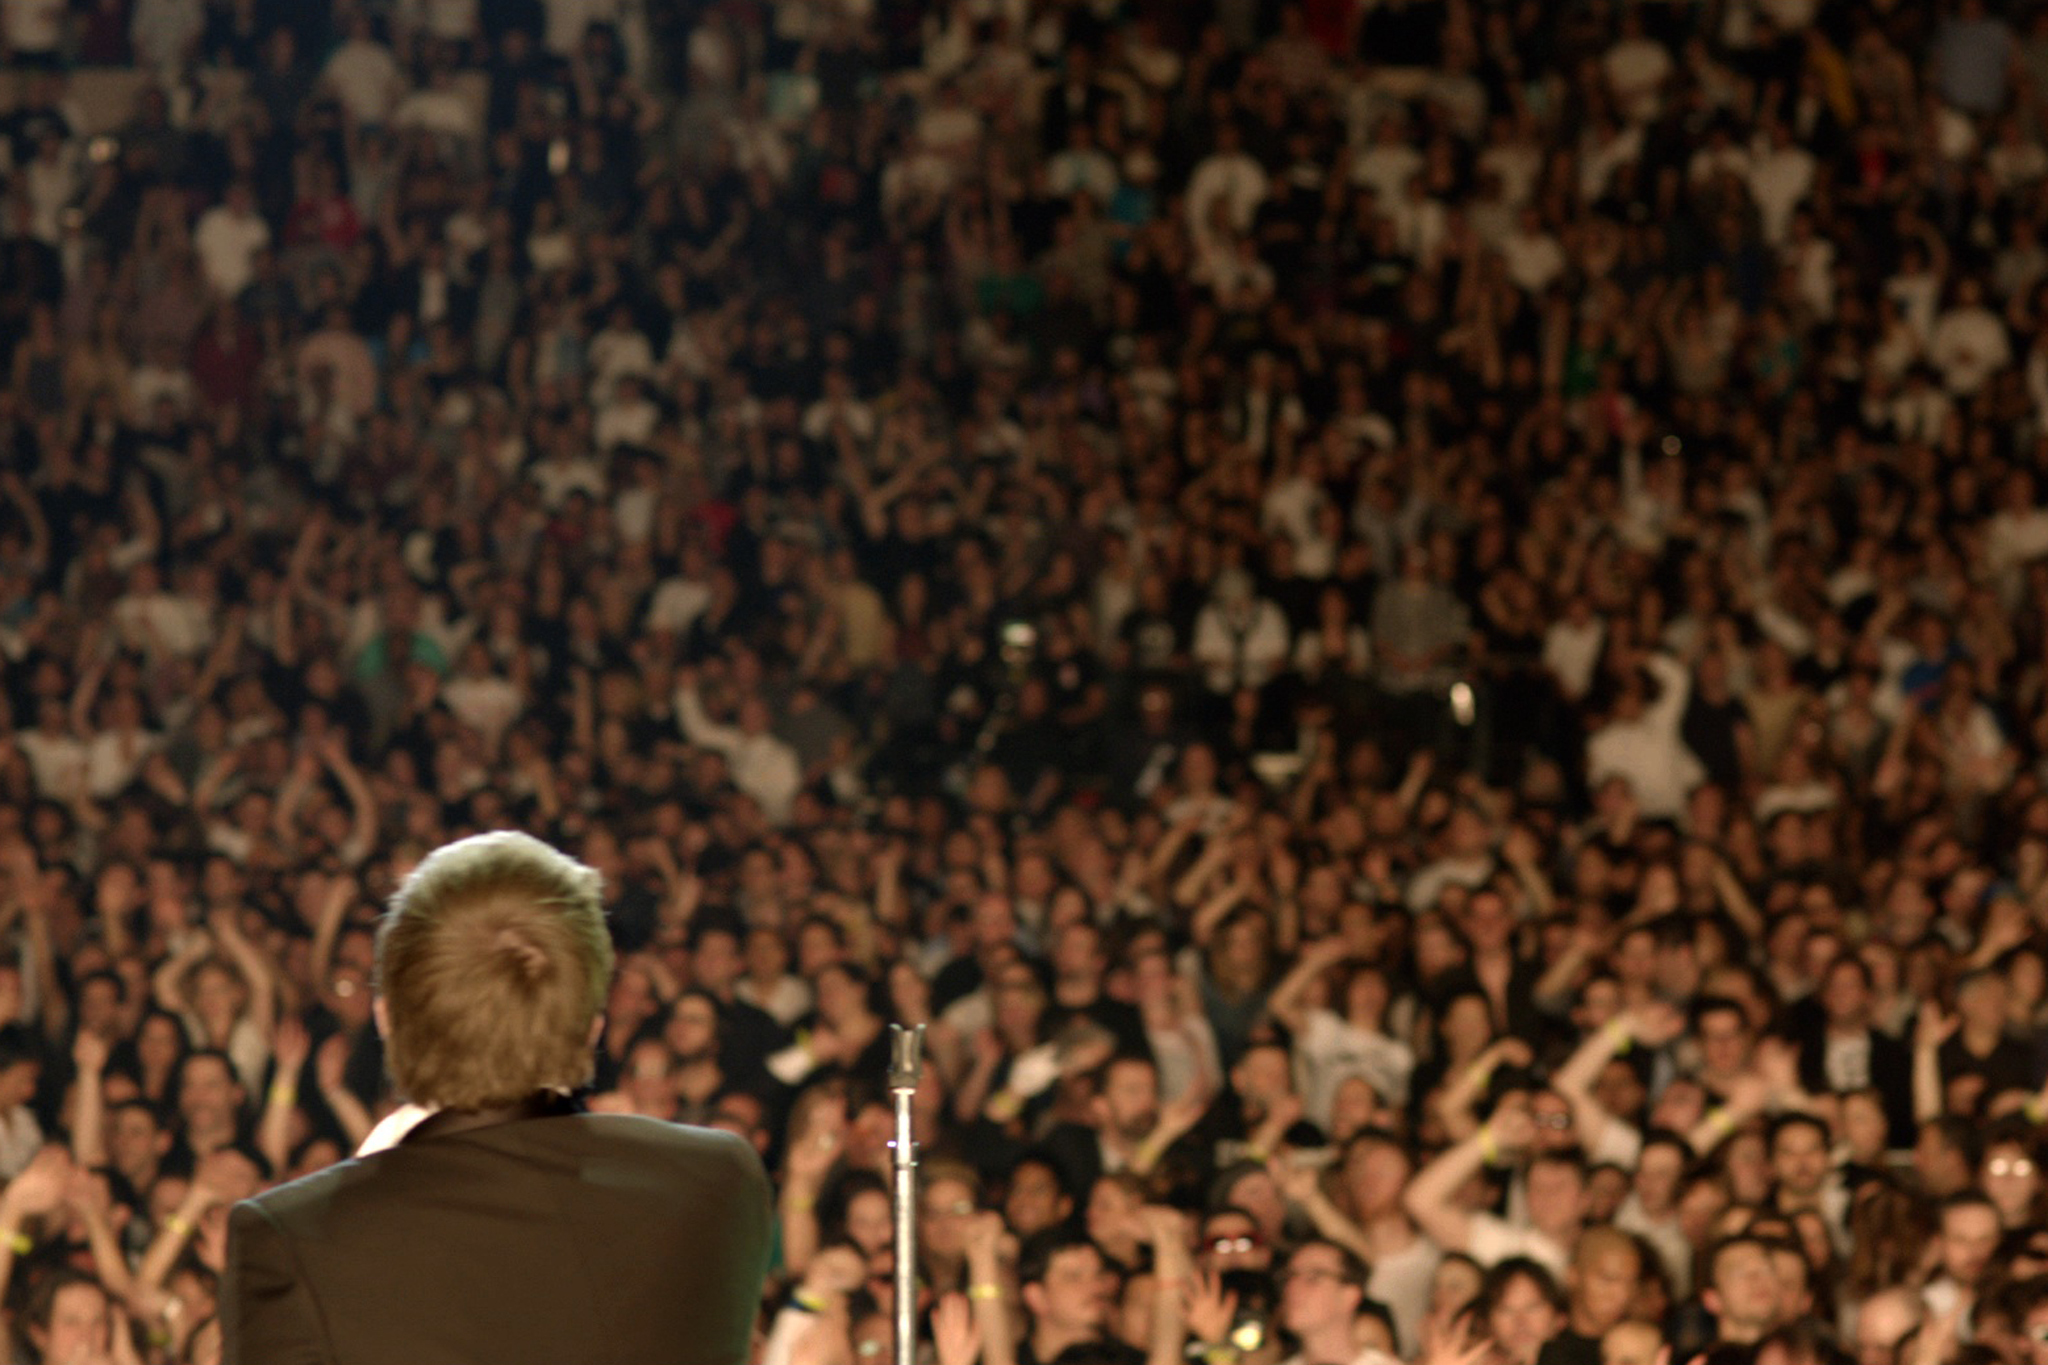 LCD Soundsystem will headline Panorama Music Festival